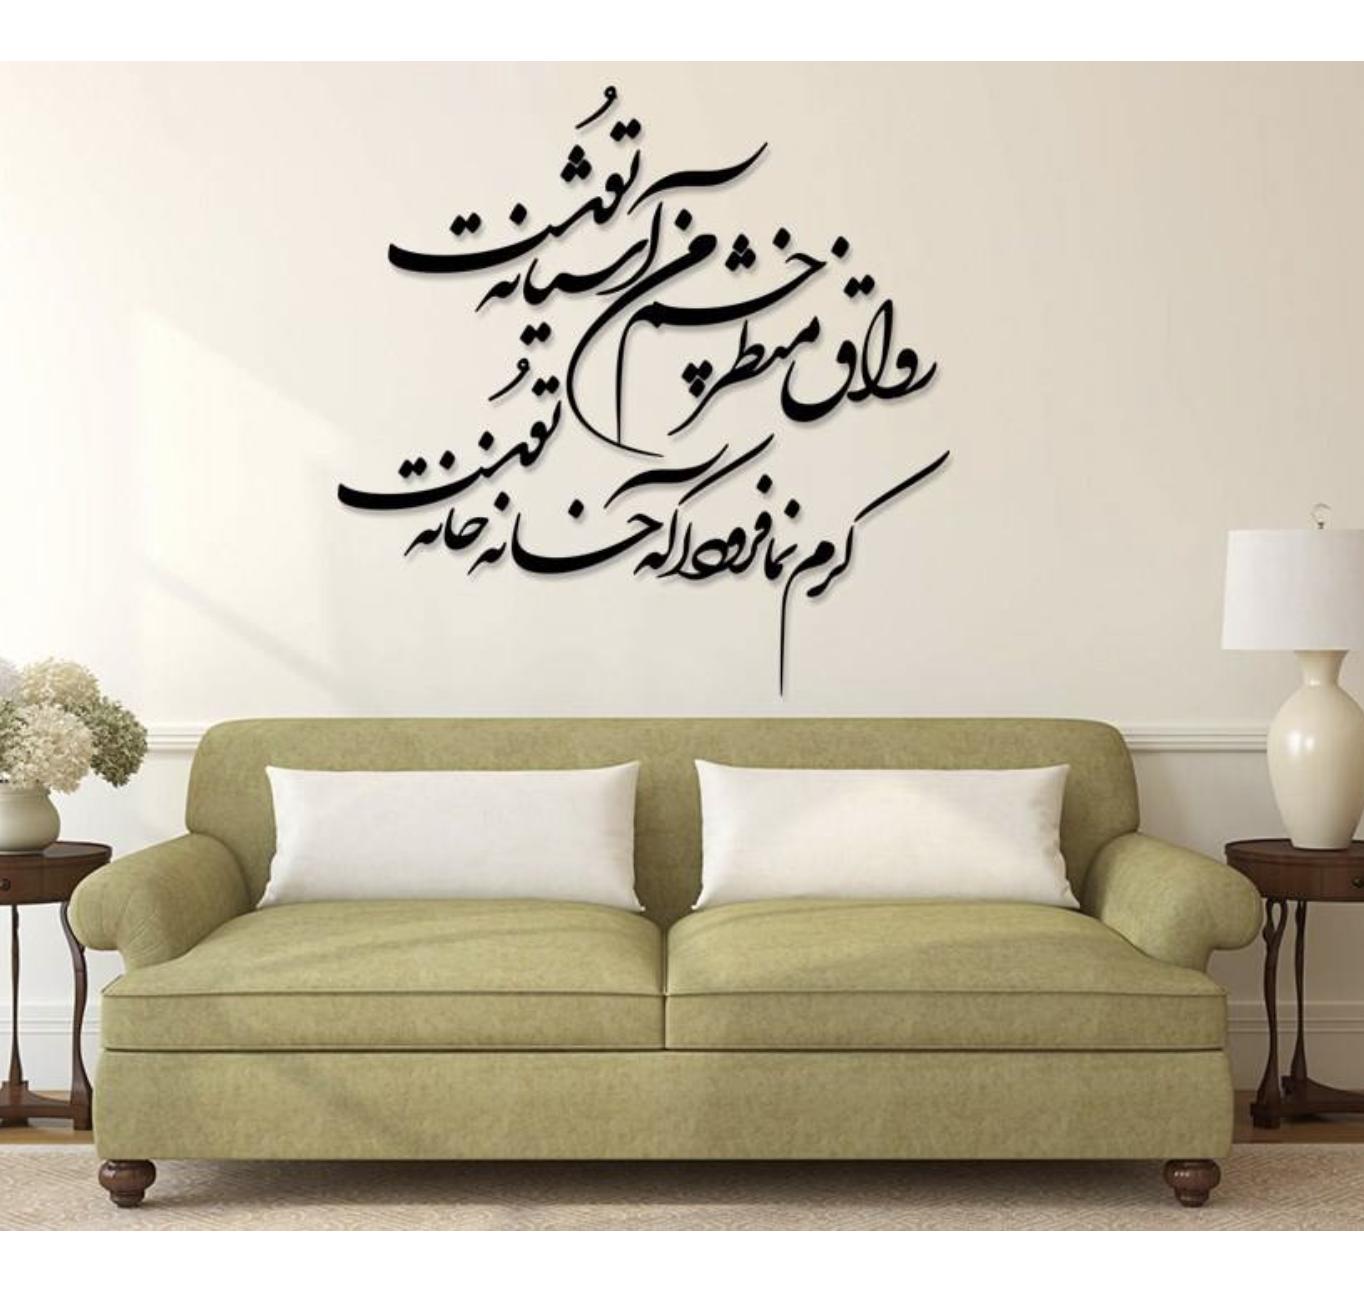 Wooden Sticker - Ashianeh - 90cm x 90cm